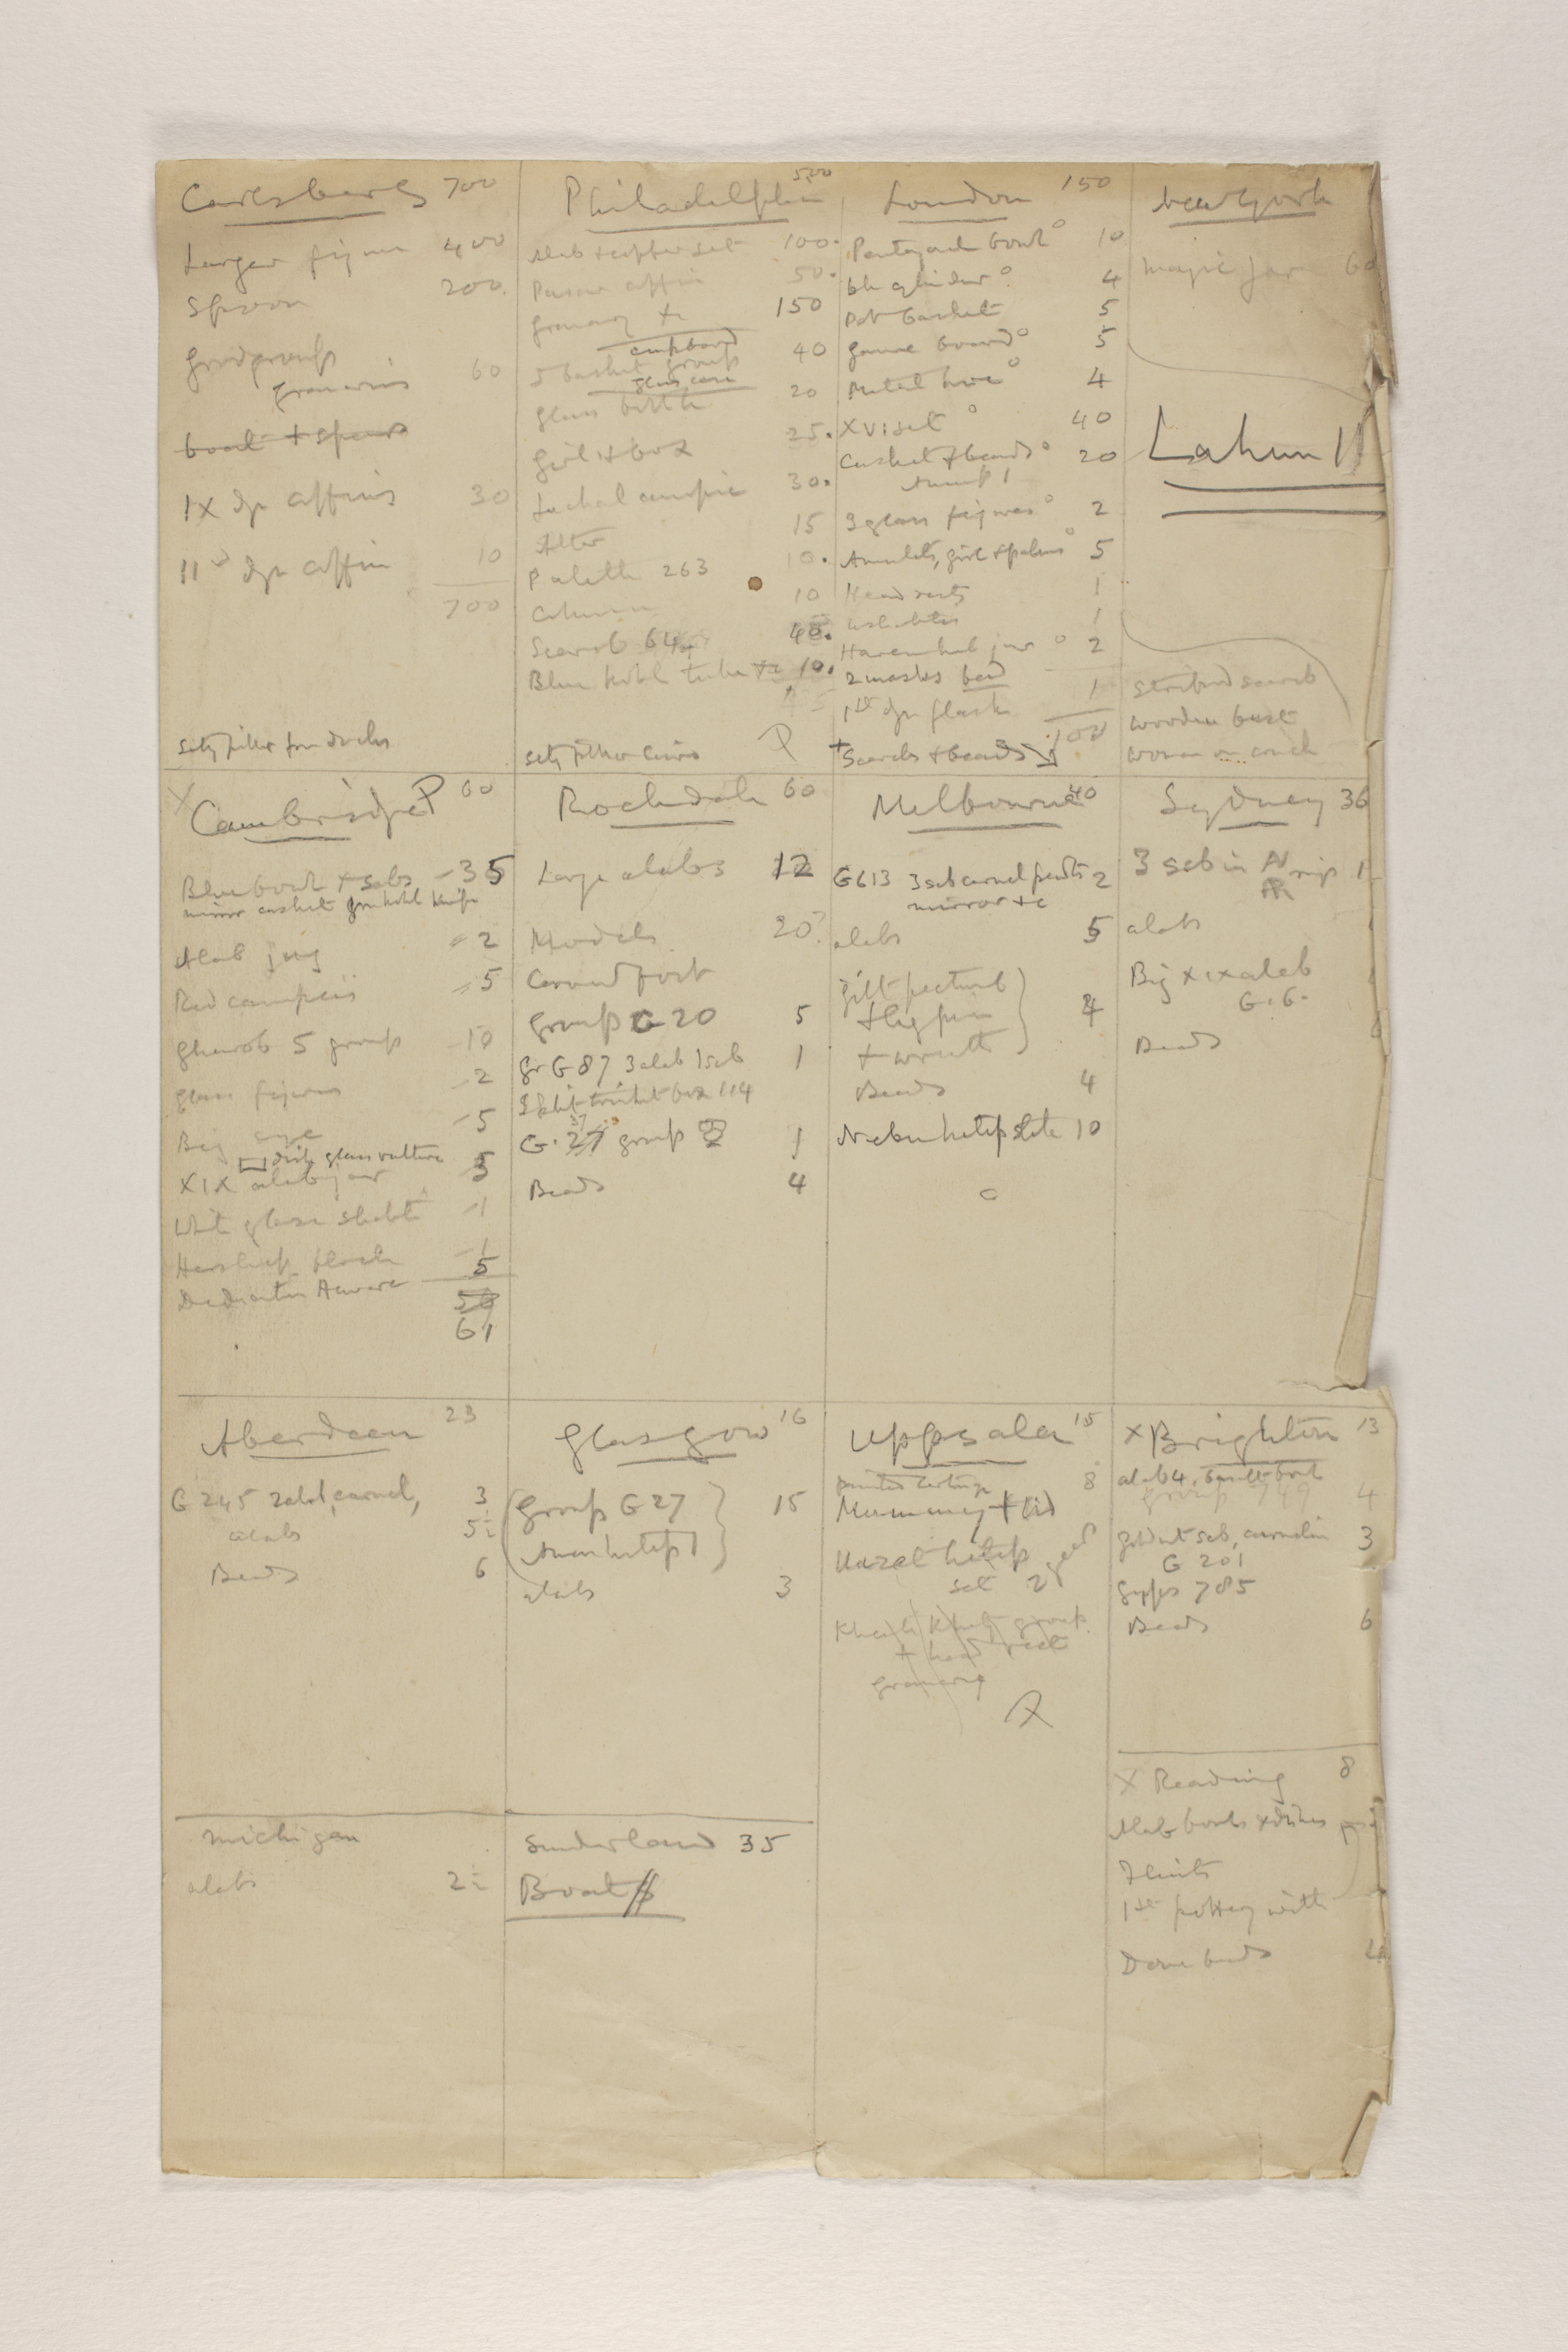 1919-21 Sedment, Lahun Multiple institution list PMA/WFP1/D/24/8